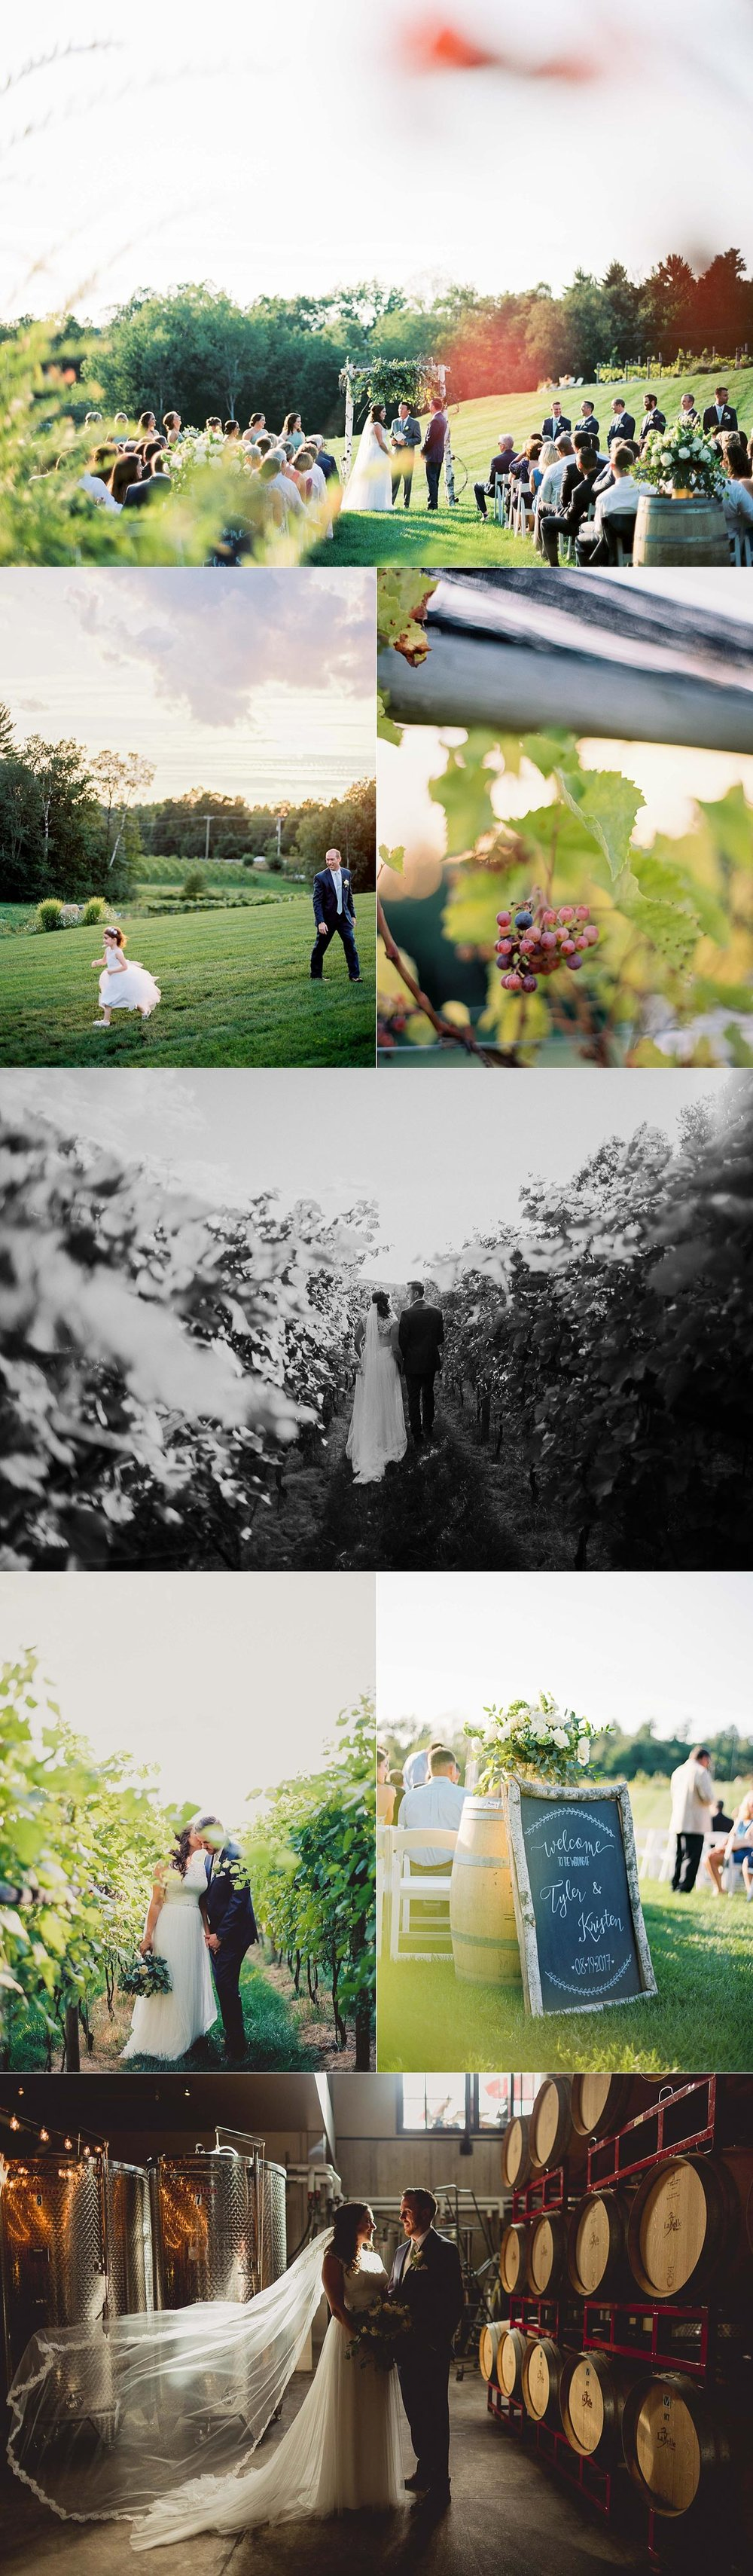 LeBelle Winery Wedding-9.jpg